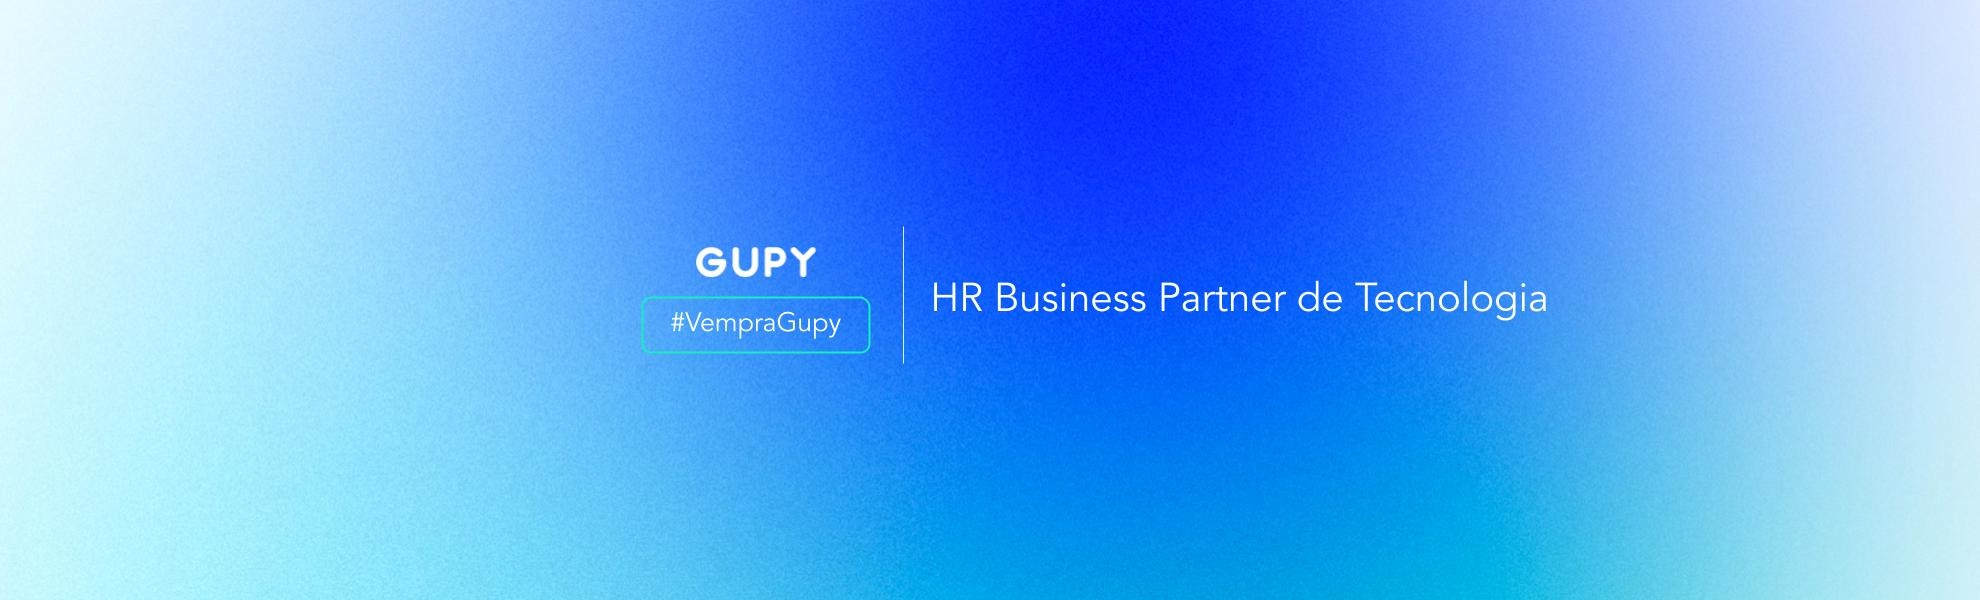 HR Business Partner - Tecnologia